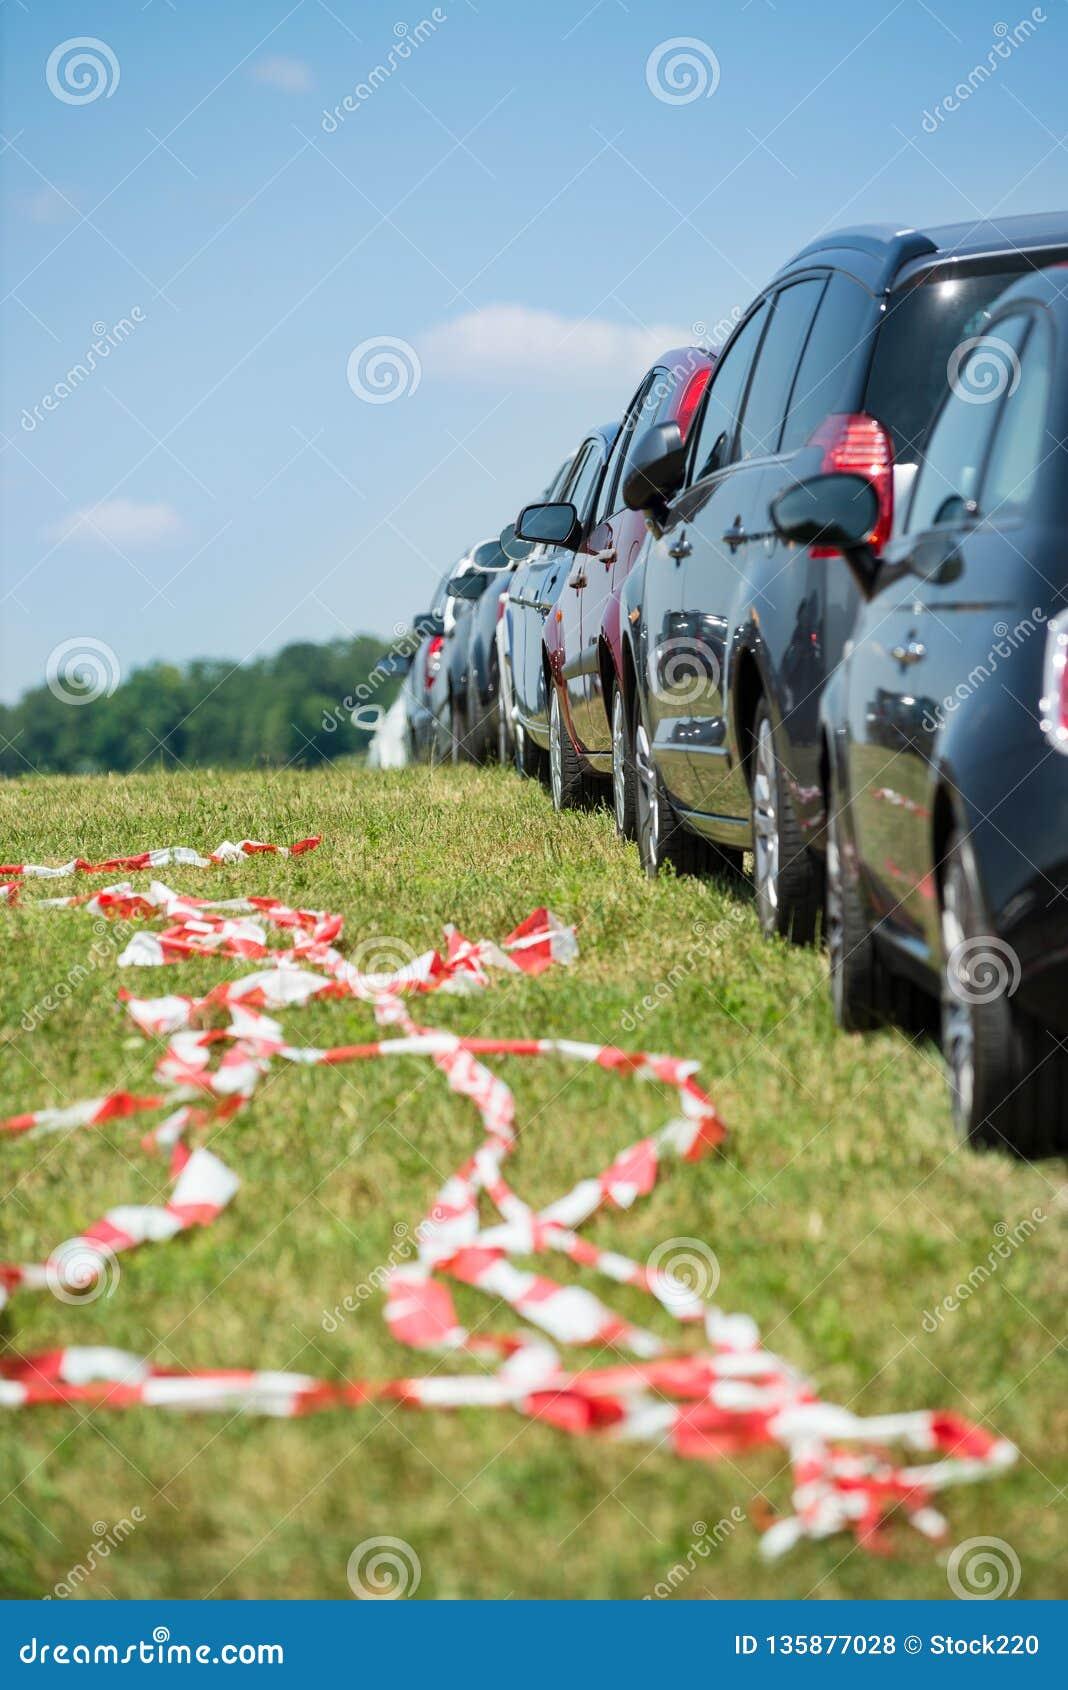 Car parking in line